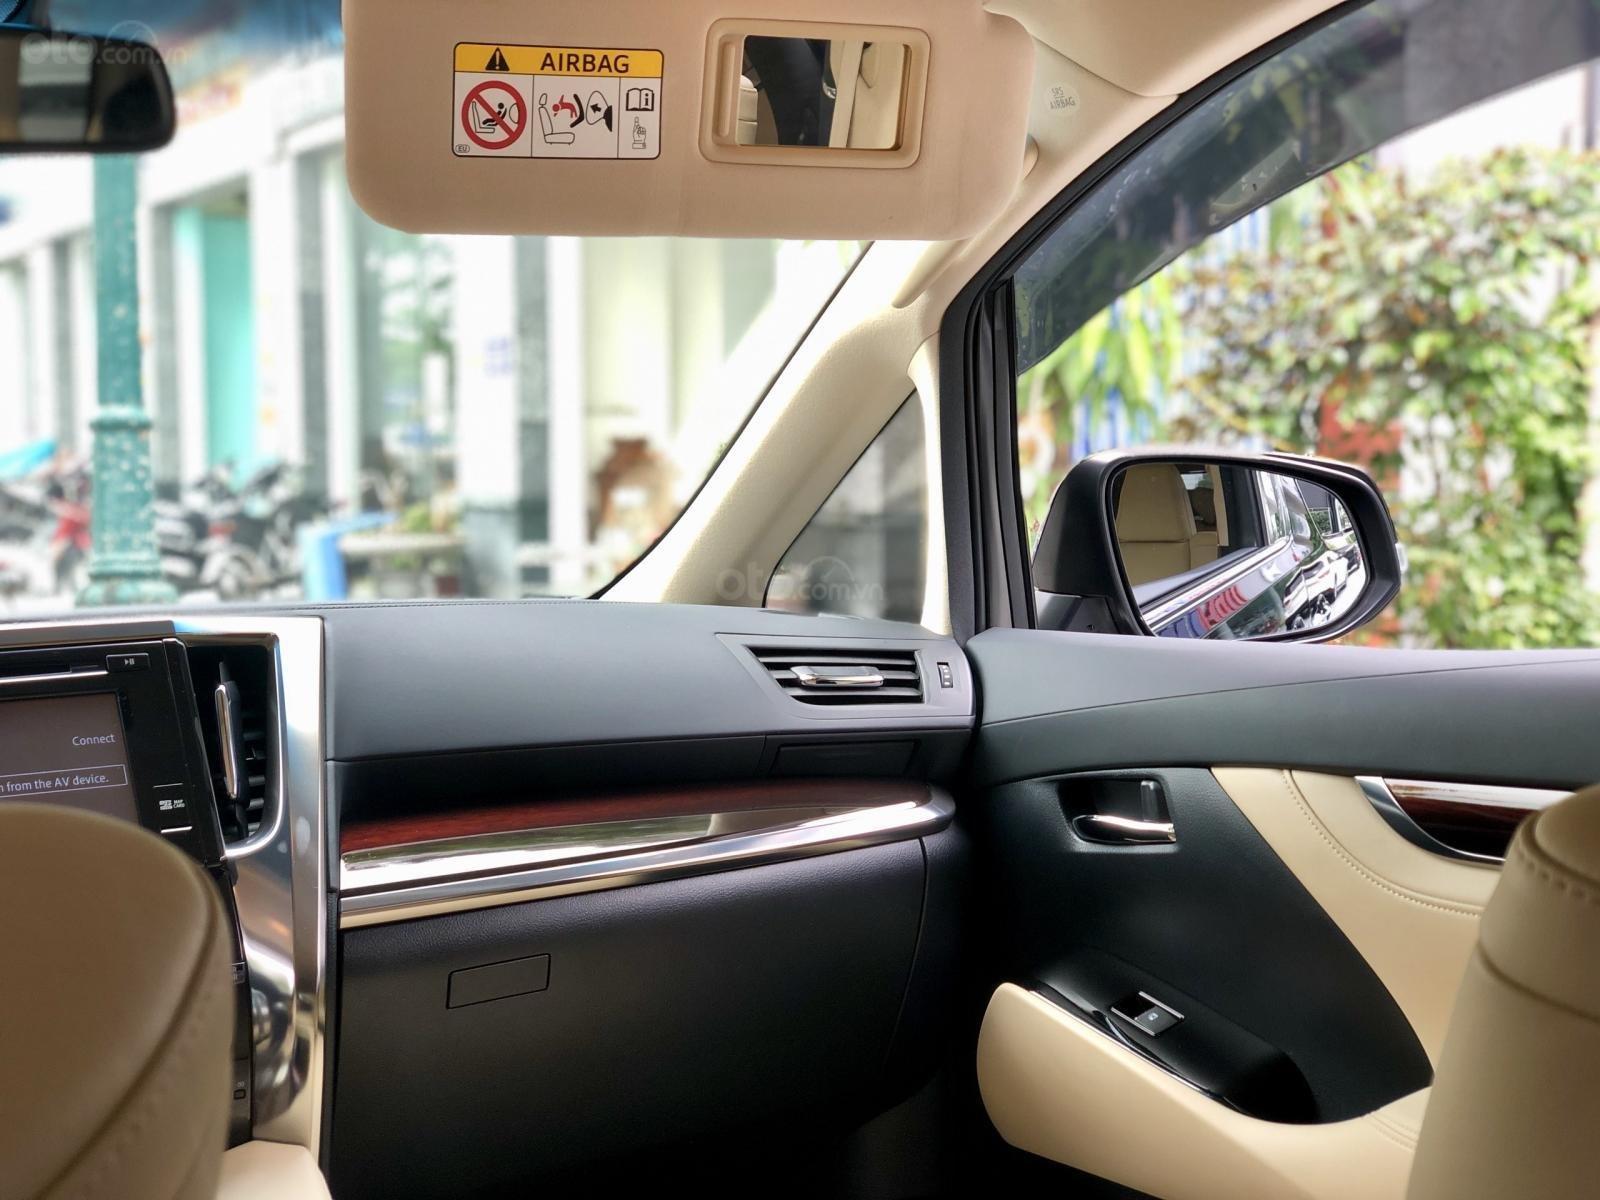 Bán Toyota Alphard 3.5L - V6 sản xuất 2017 model 2018, Mr Huân 0981010161 (18)